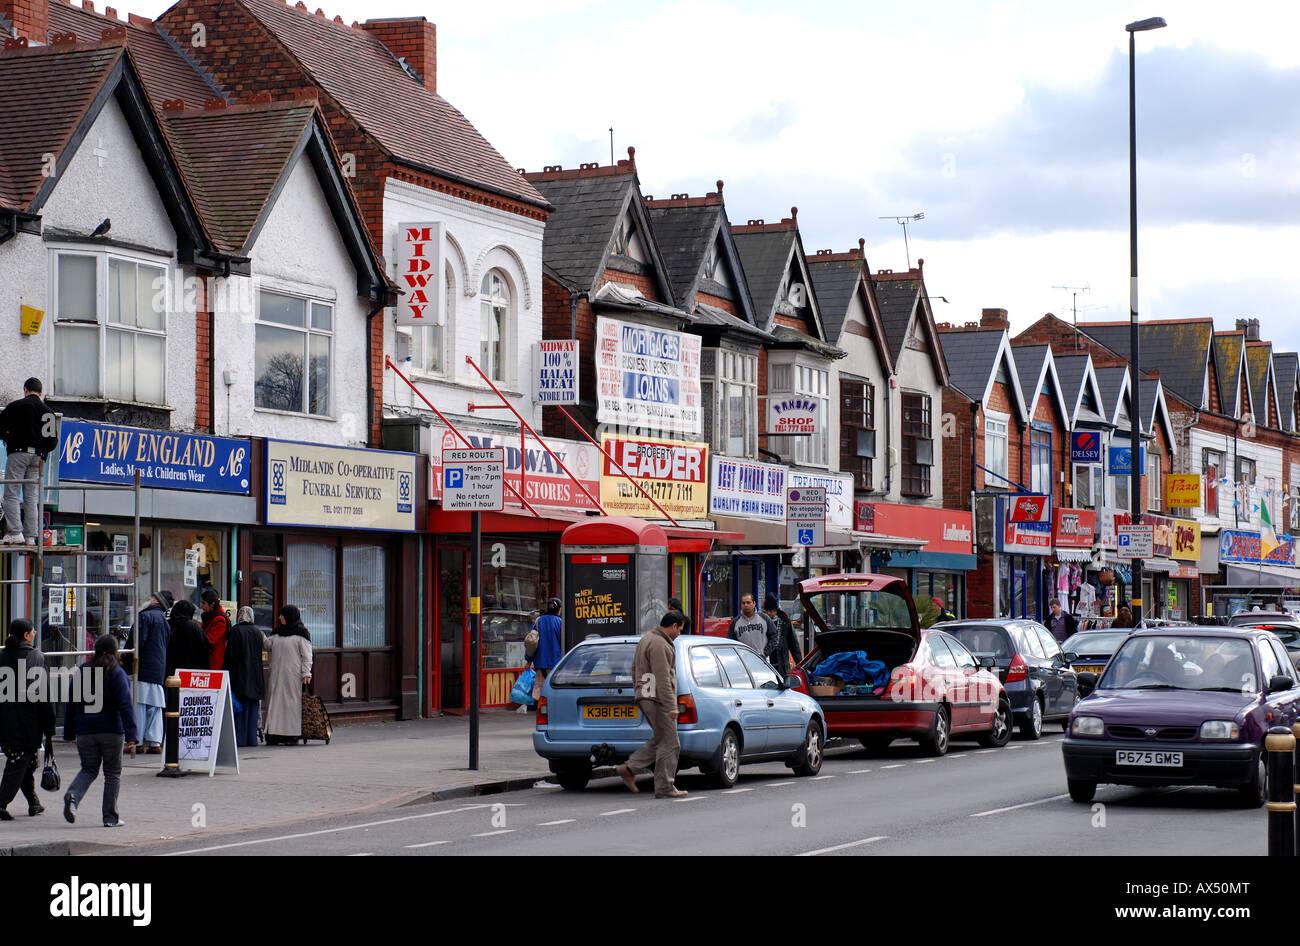 Where Live Suburbs Birmingham